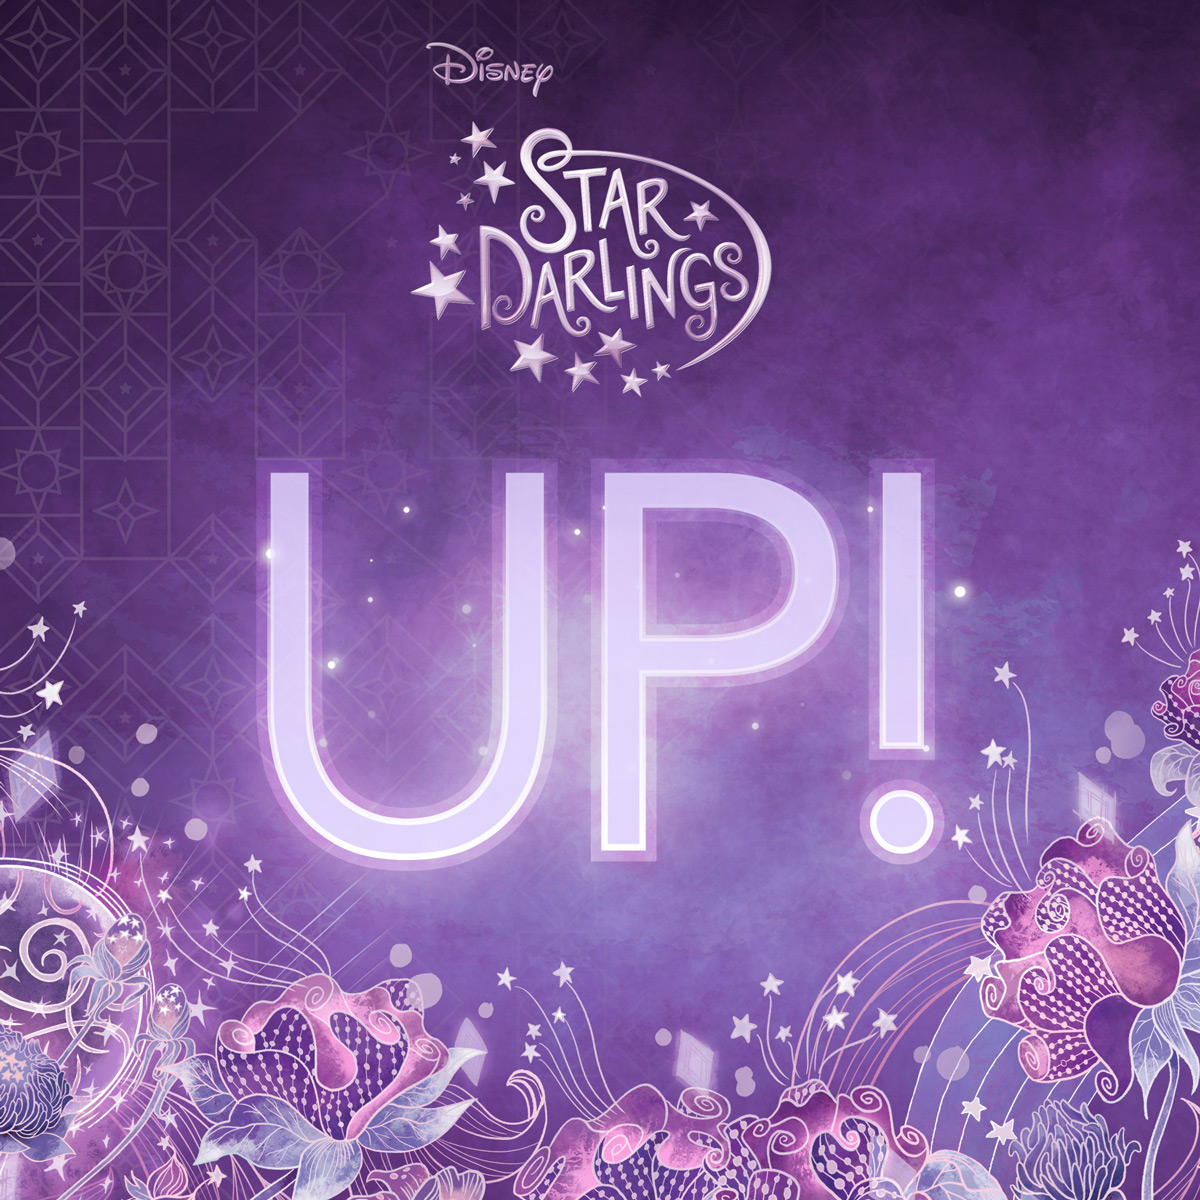 SD_UP_ALBUM_COVER_V1.jpg